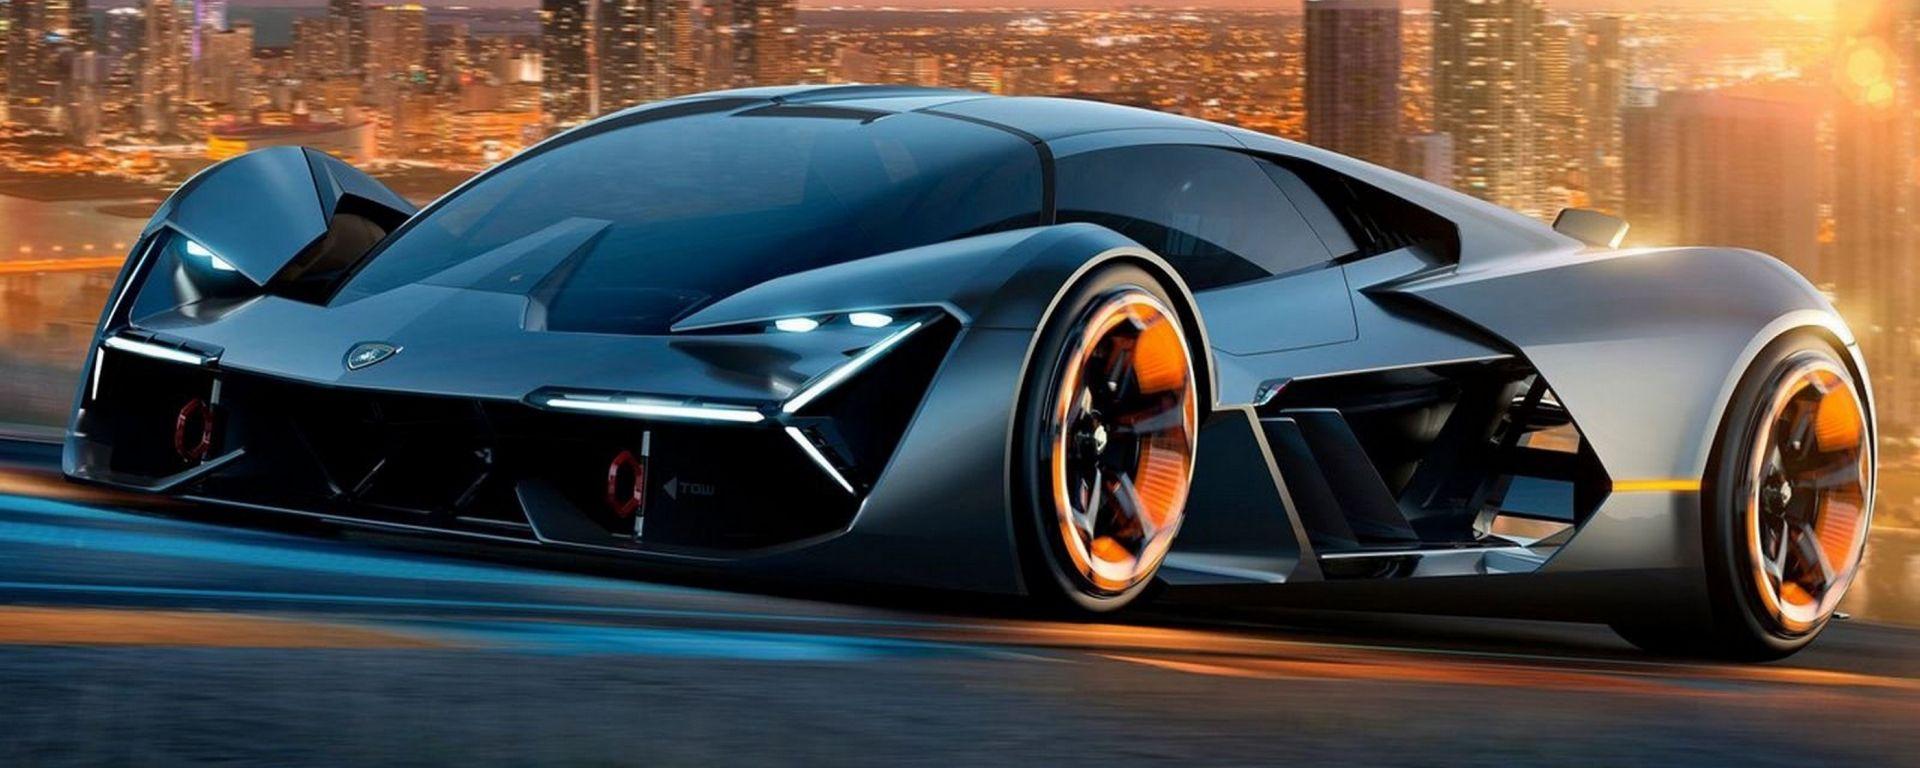 Nuova Lamborghini Aventador: l'erede sarà V12 ibrida